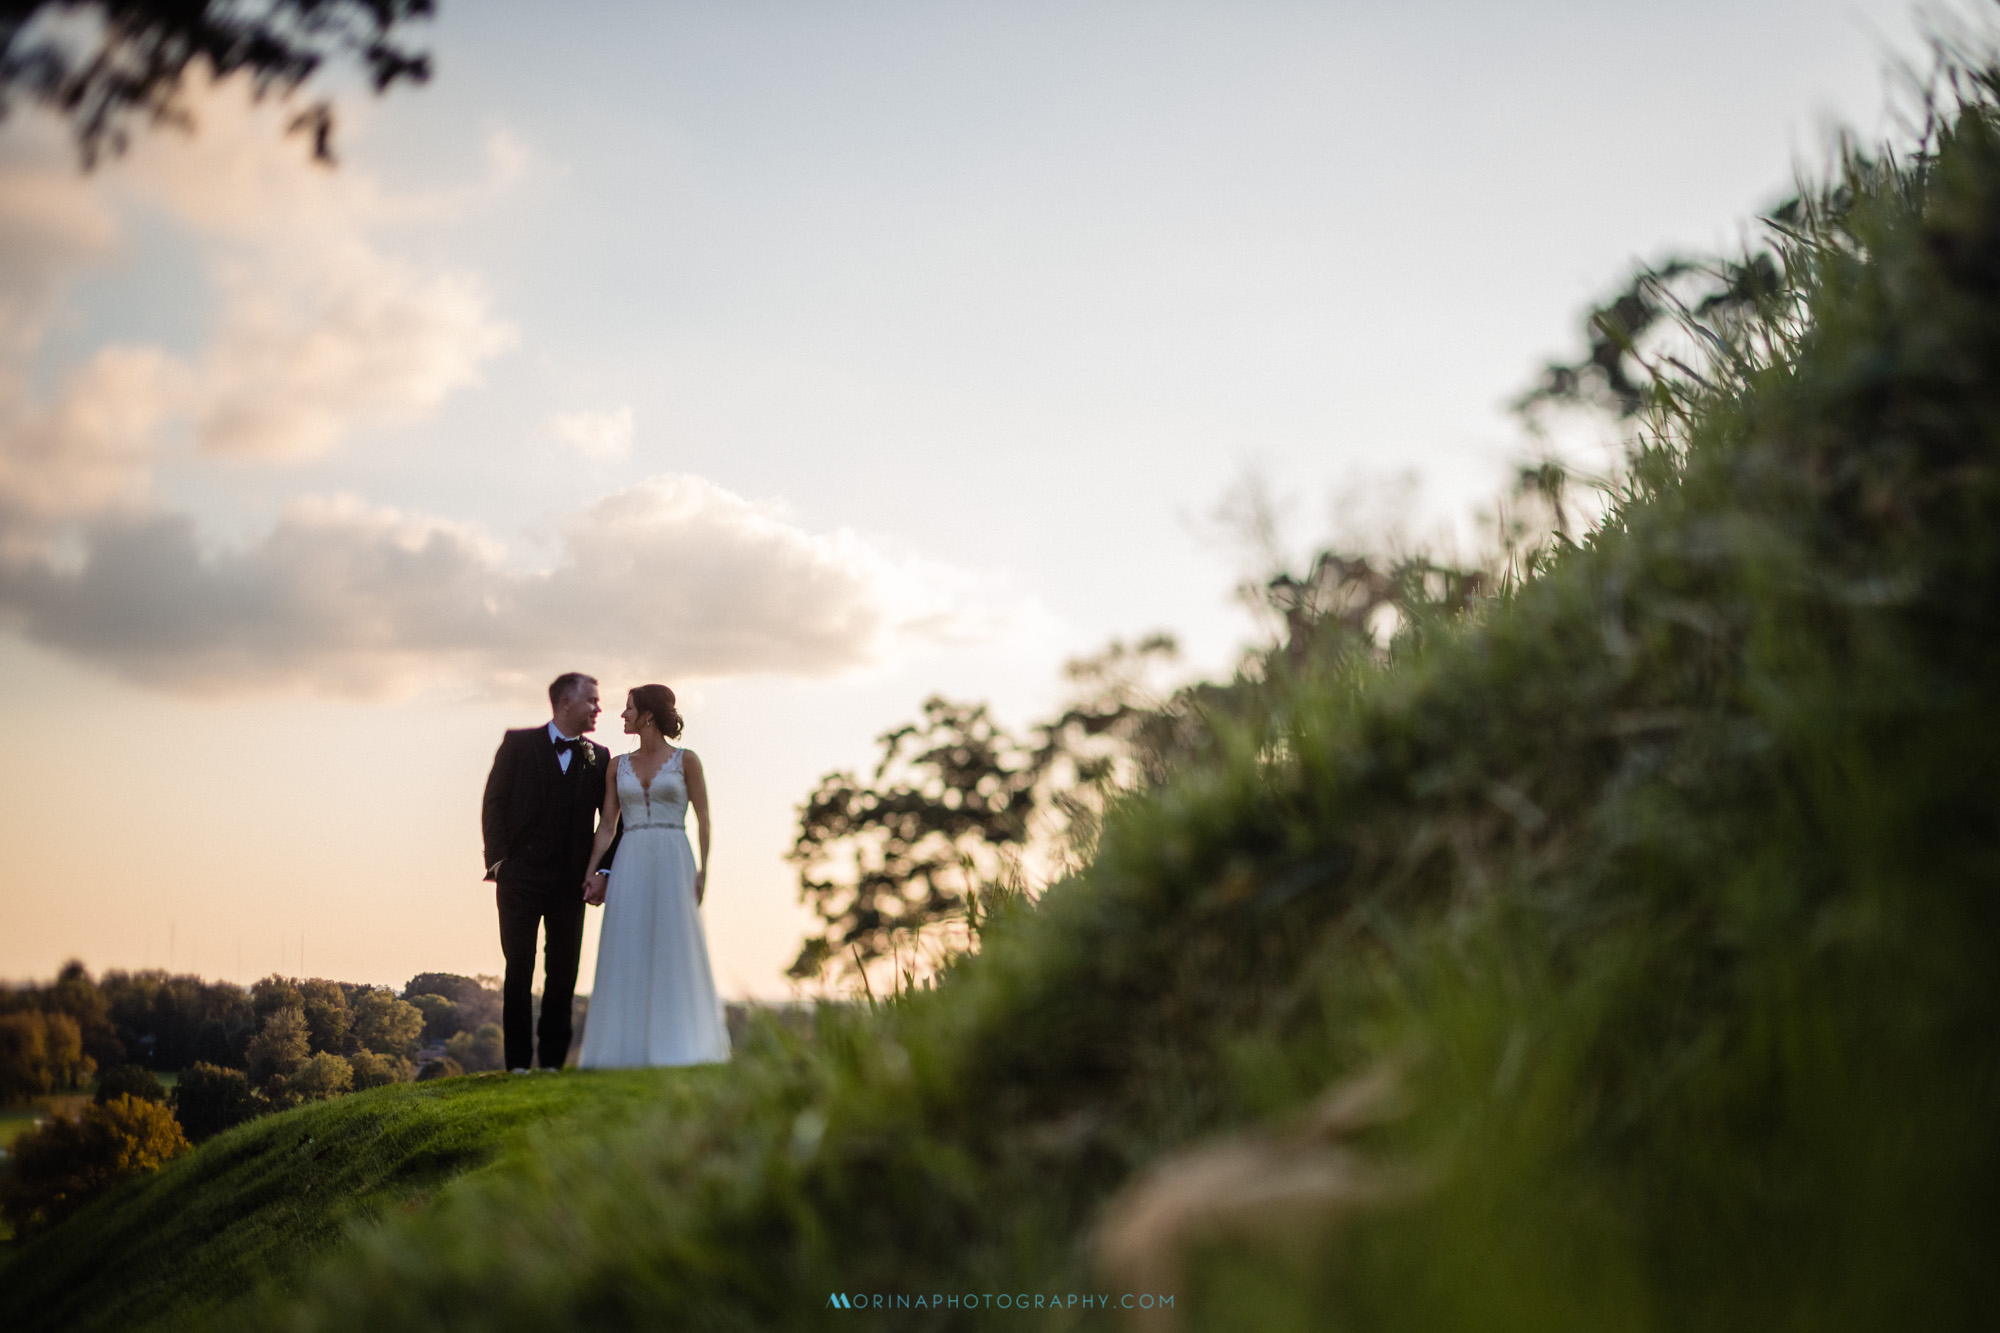 Colleen & Bill Wedding at Manufacturers' Golf & Country Club wedding 0068.jpg